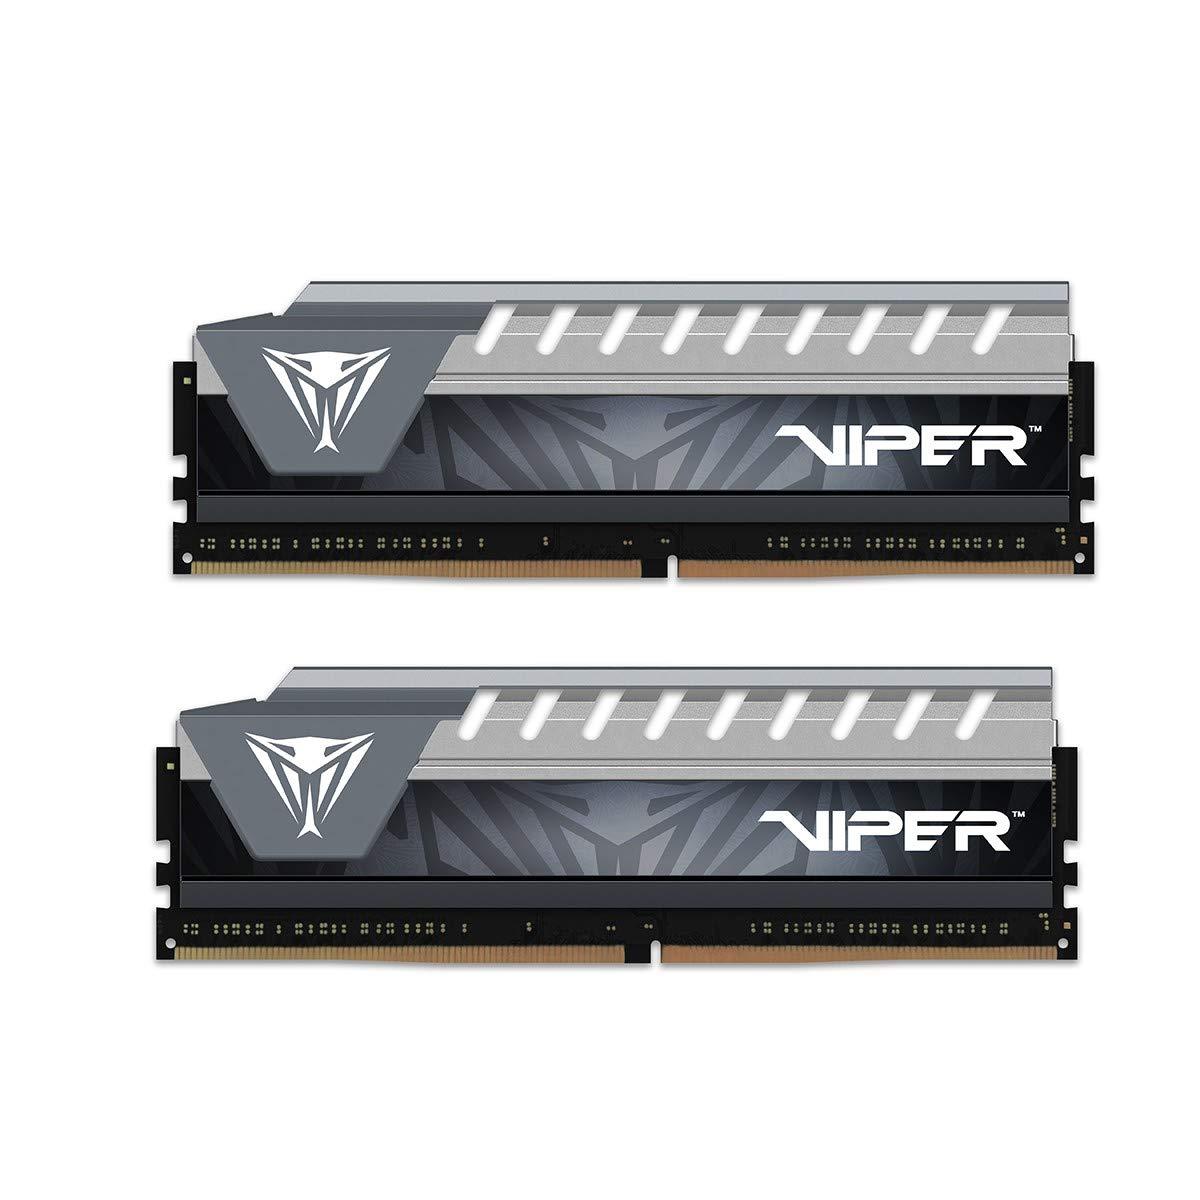 PATRIOT パトリオットメモリー デスクトップ用メモリ Viper Elite シリーズ DDR4 2666MHz (PC4-21300) 8GBx2 ブラック・グレーヒートシンク PVE416G266C6KGY